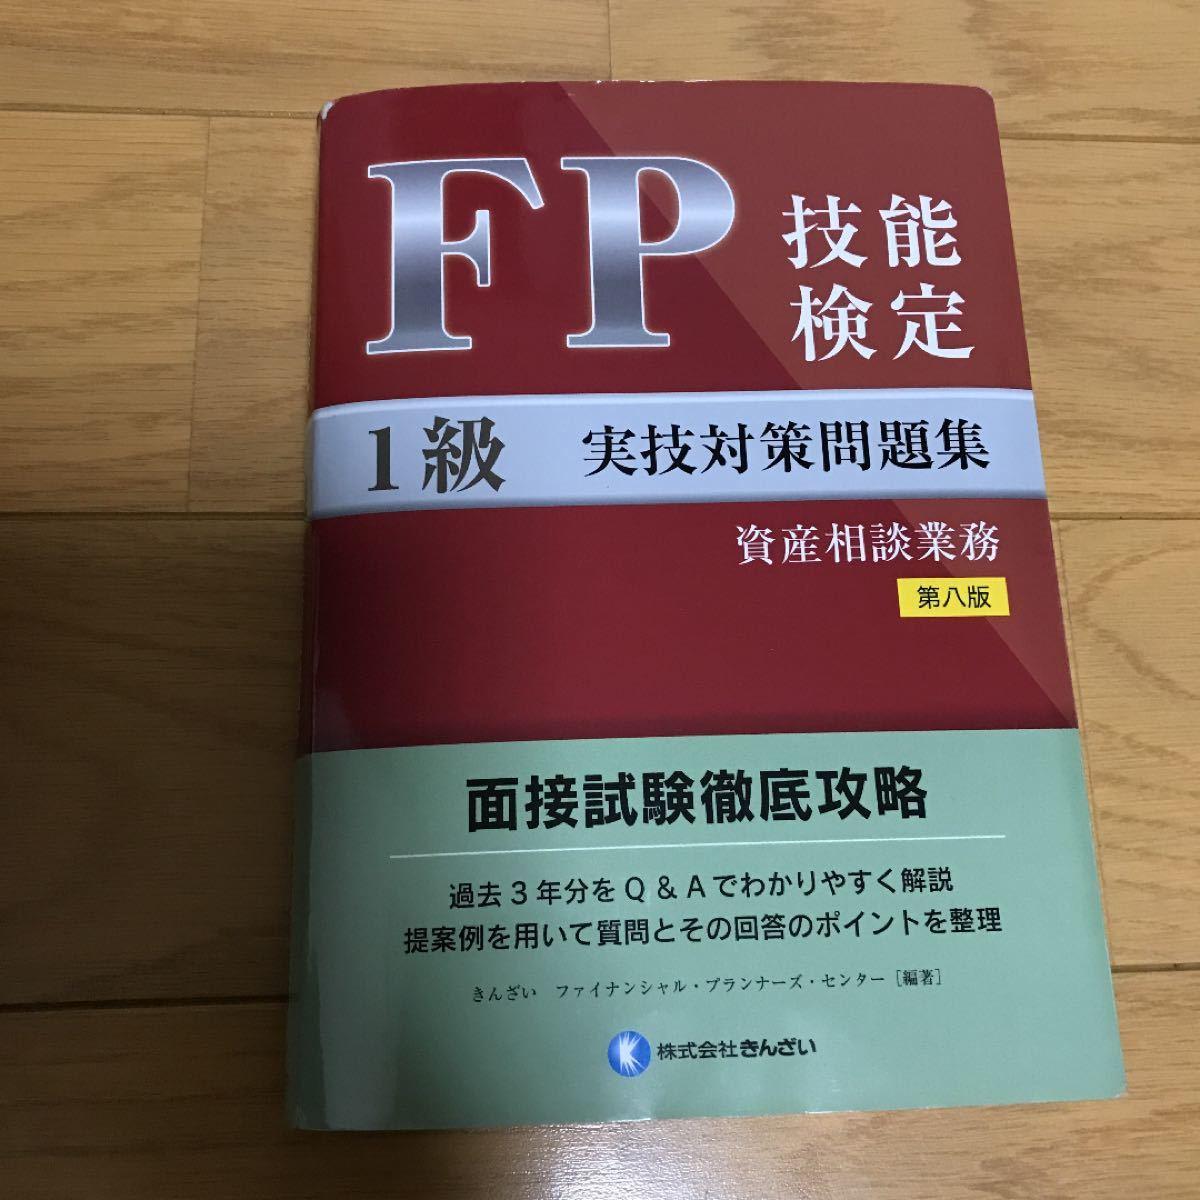 FP技能検定1級実技対策問題集資産相談業務/きんざいファイナンシャルプランナーズセンター